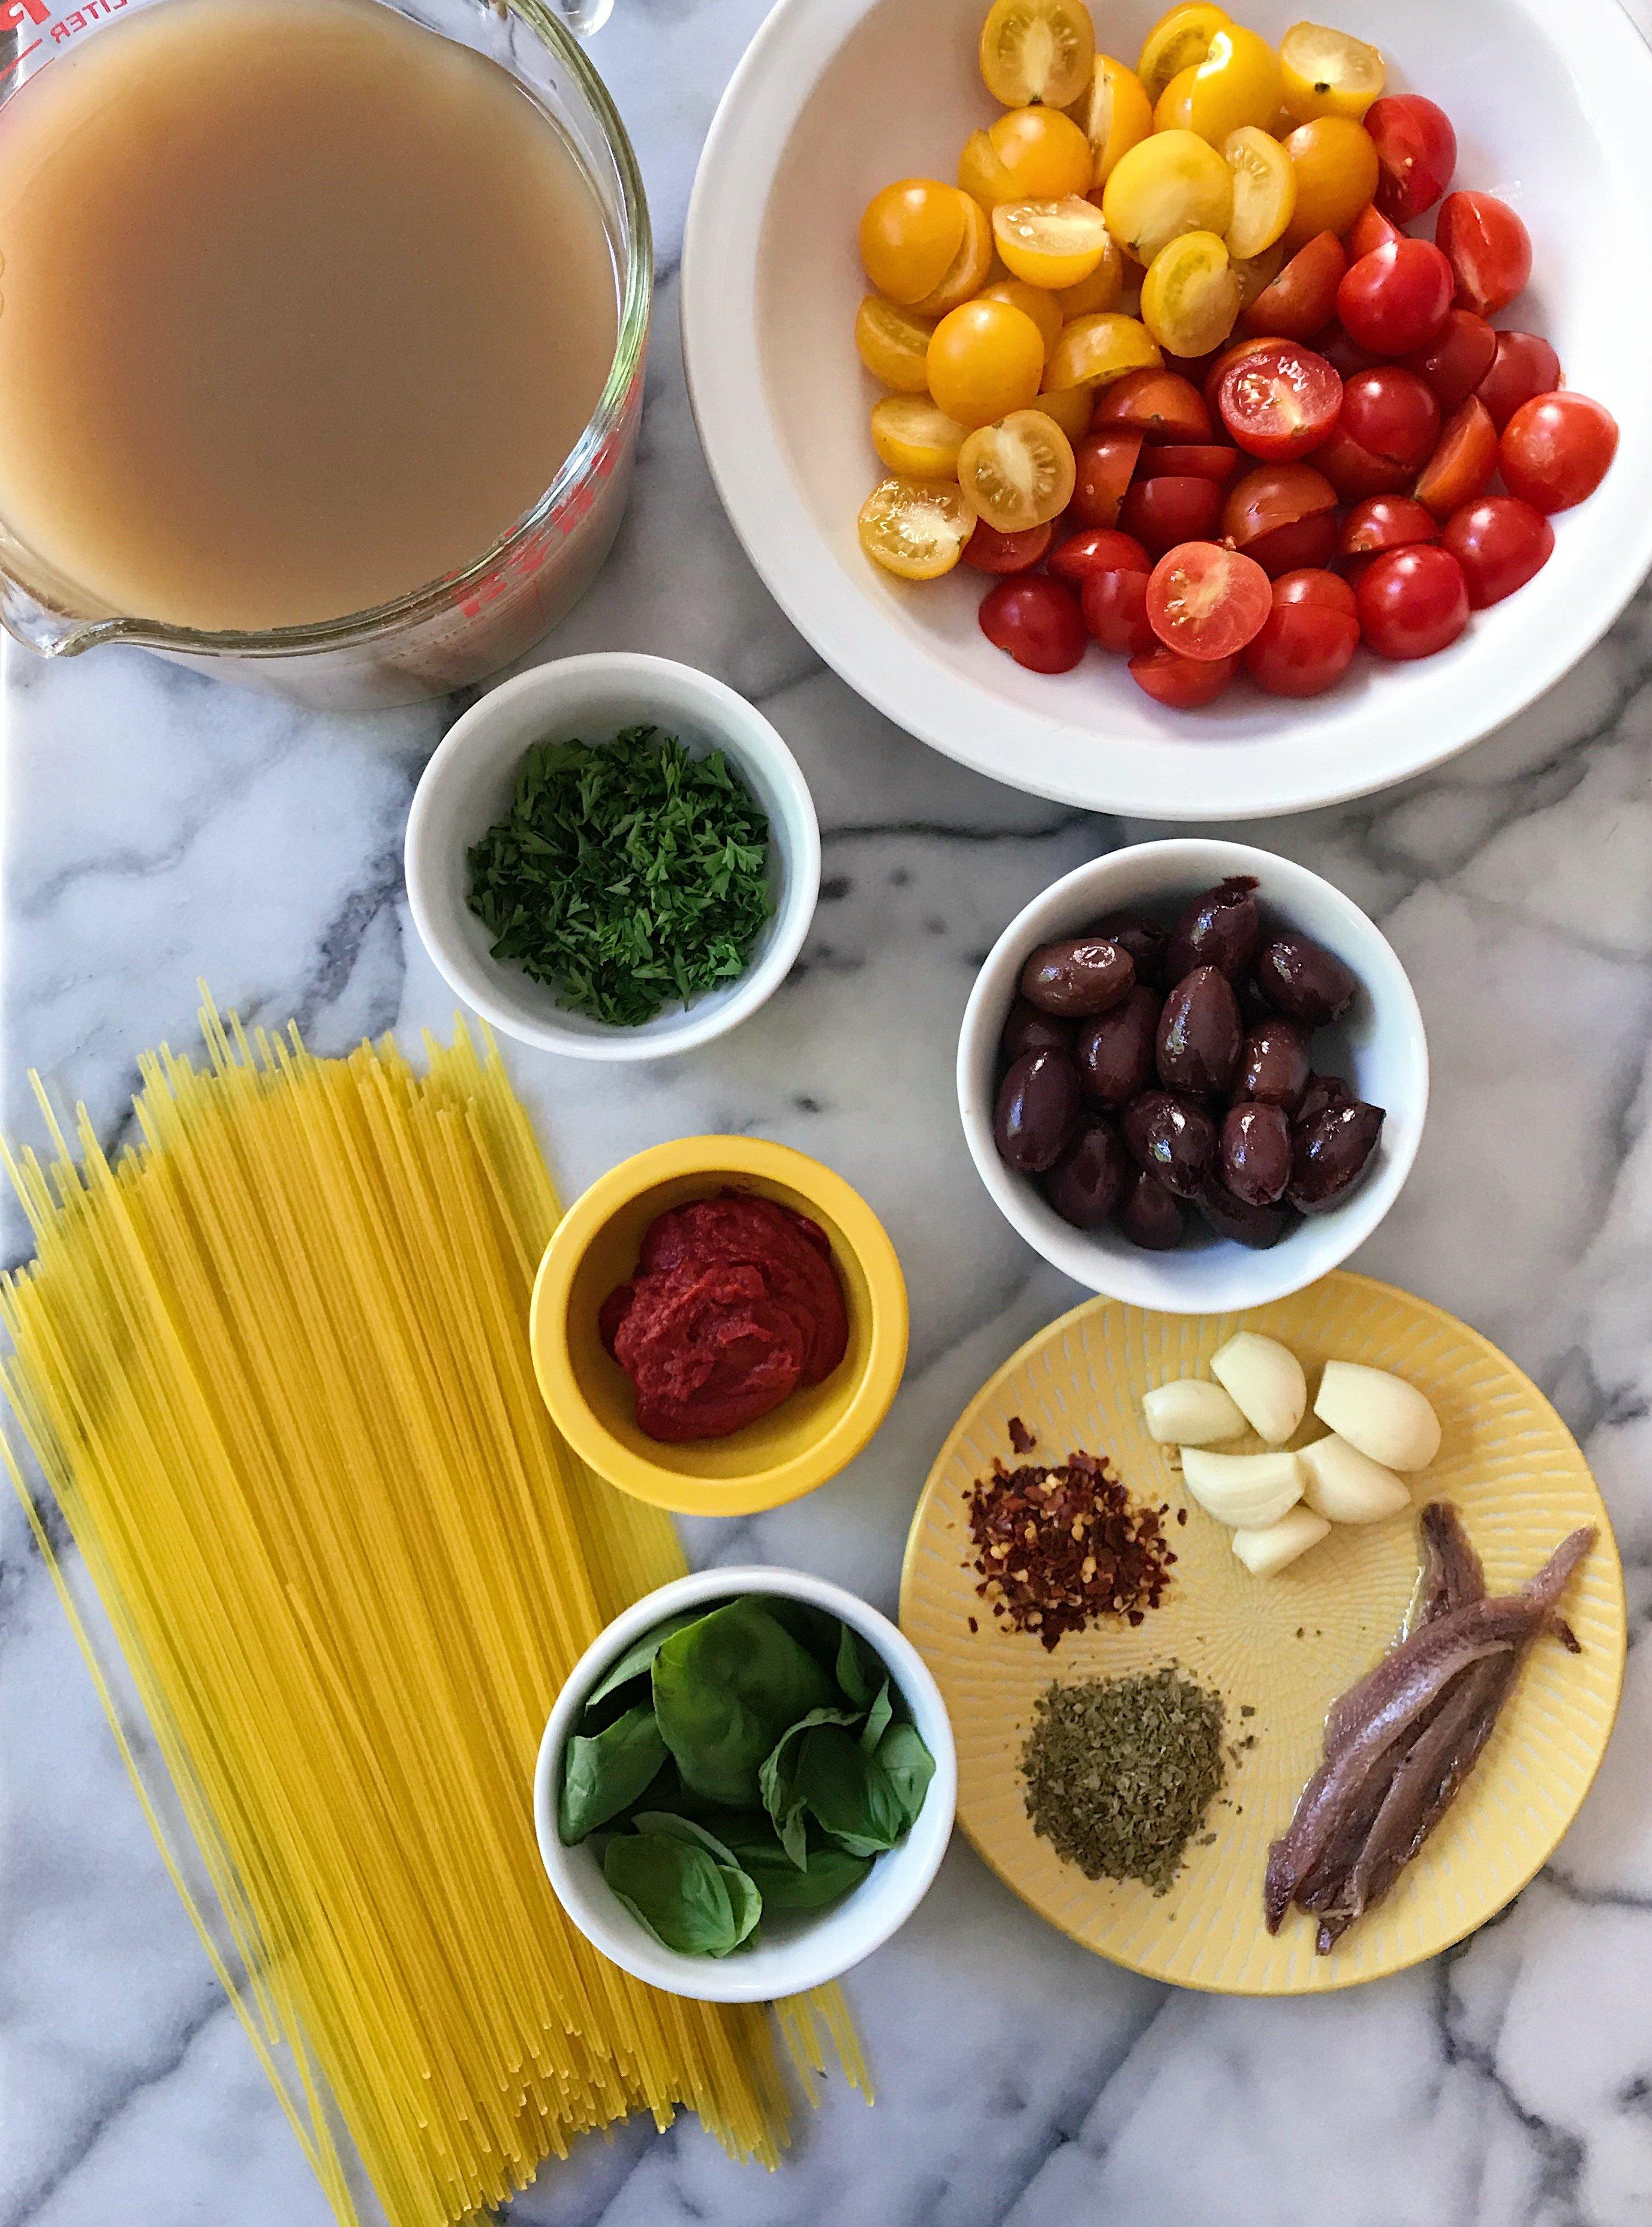 gluten free spaghetti puttanesca #glutenfree #glutenfreerecipes www.heatlhygffamily.com